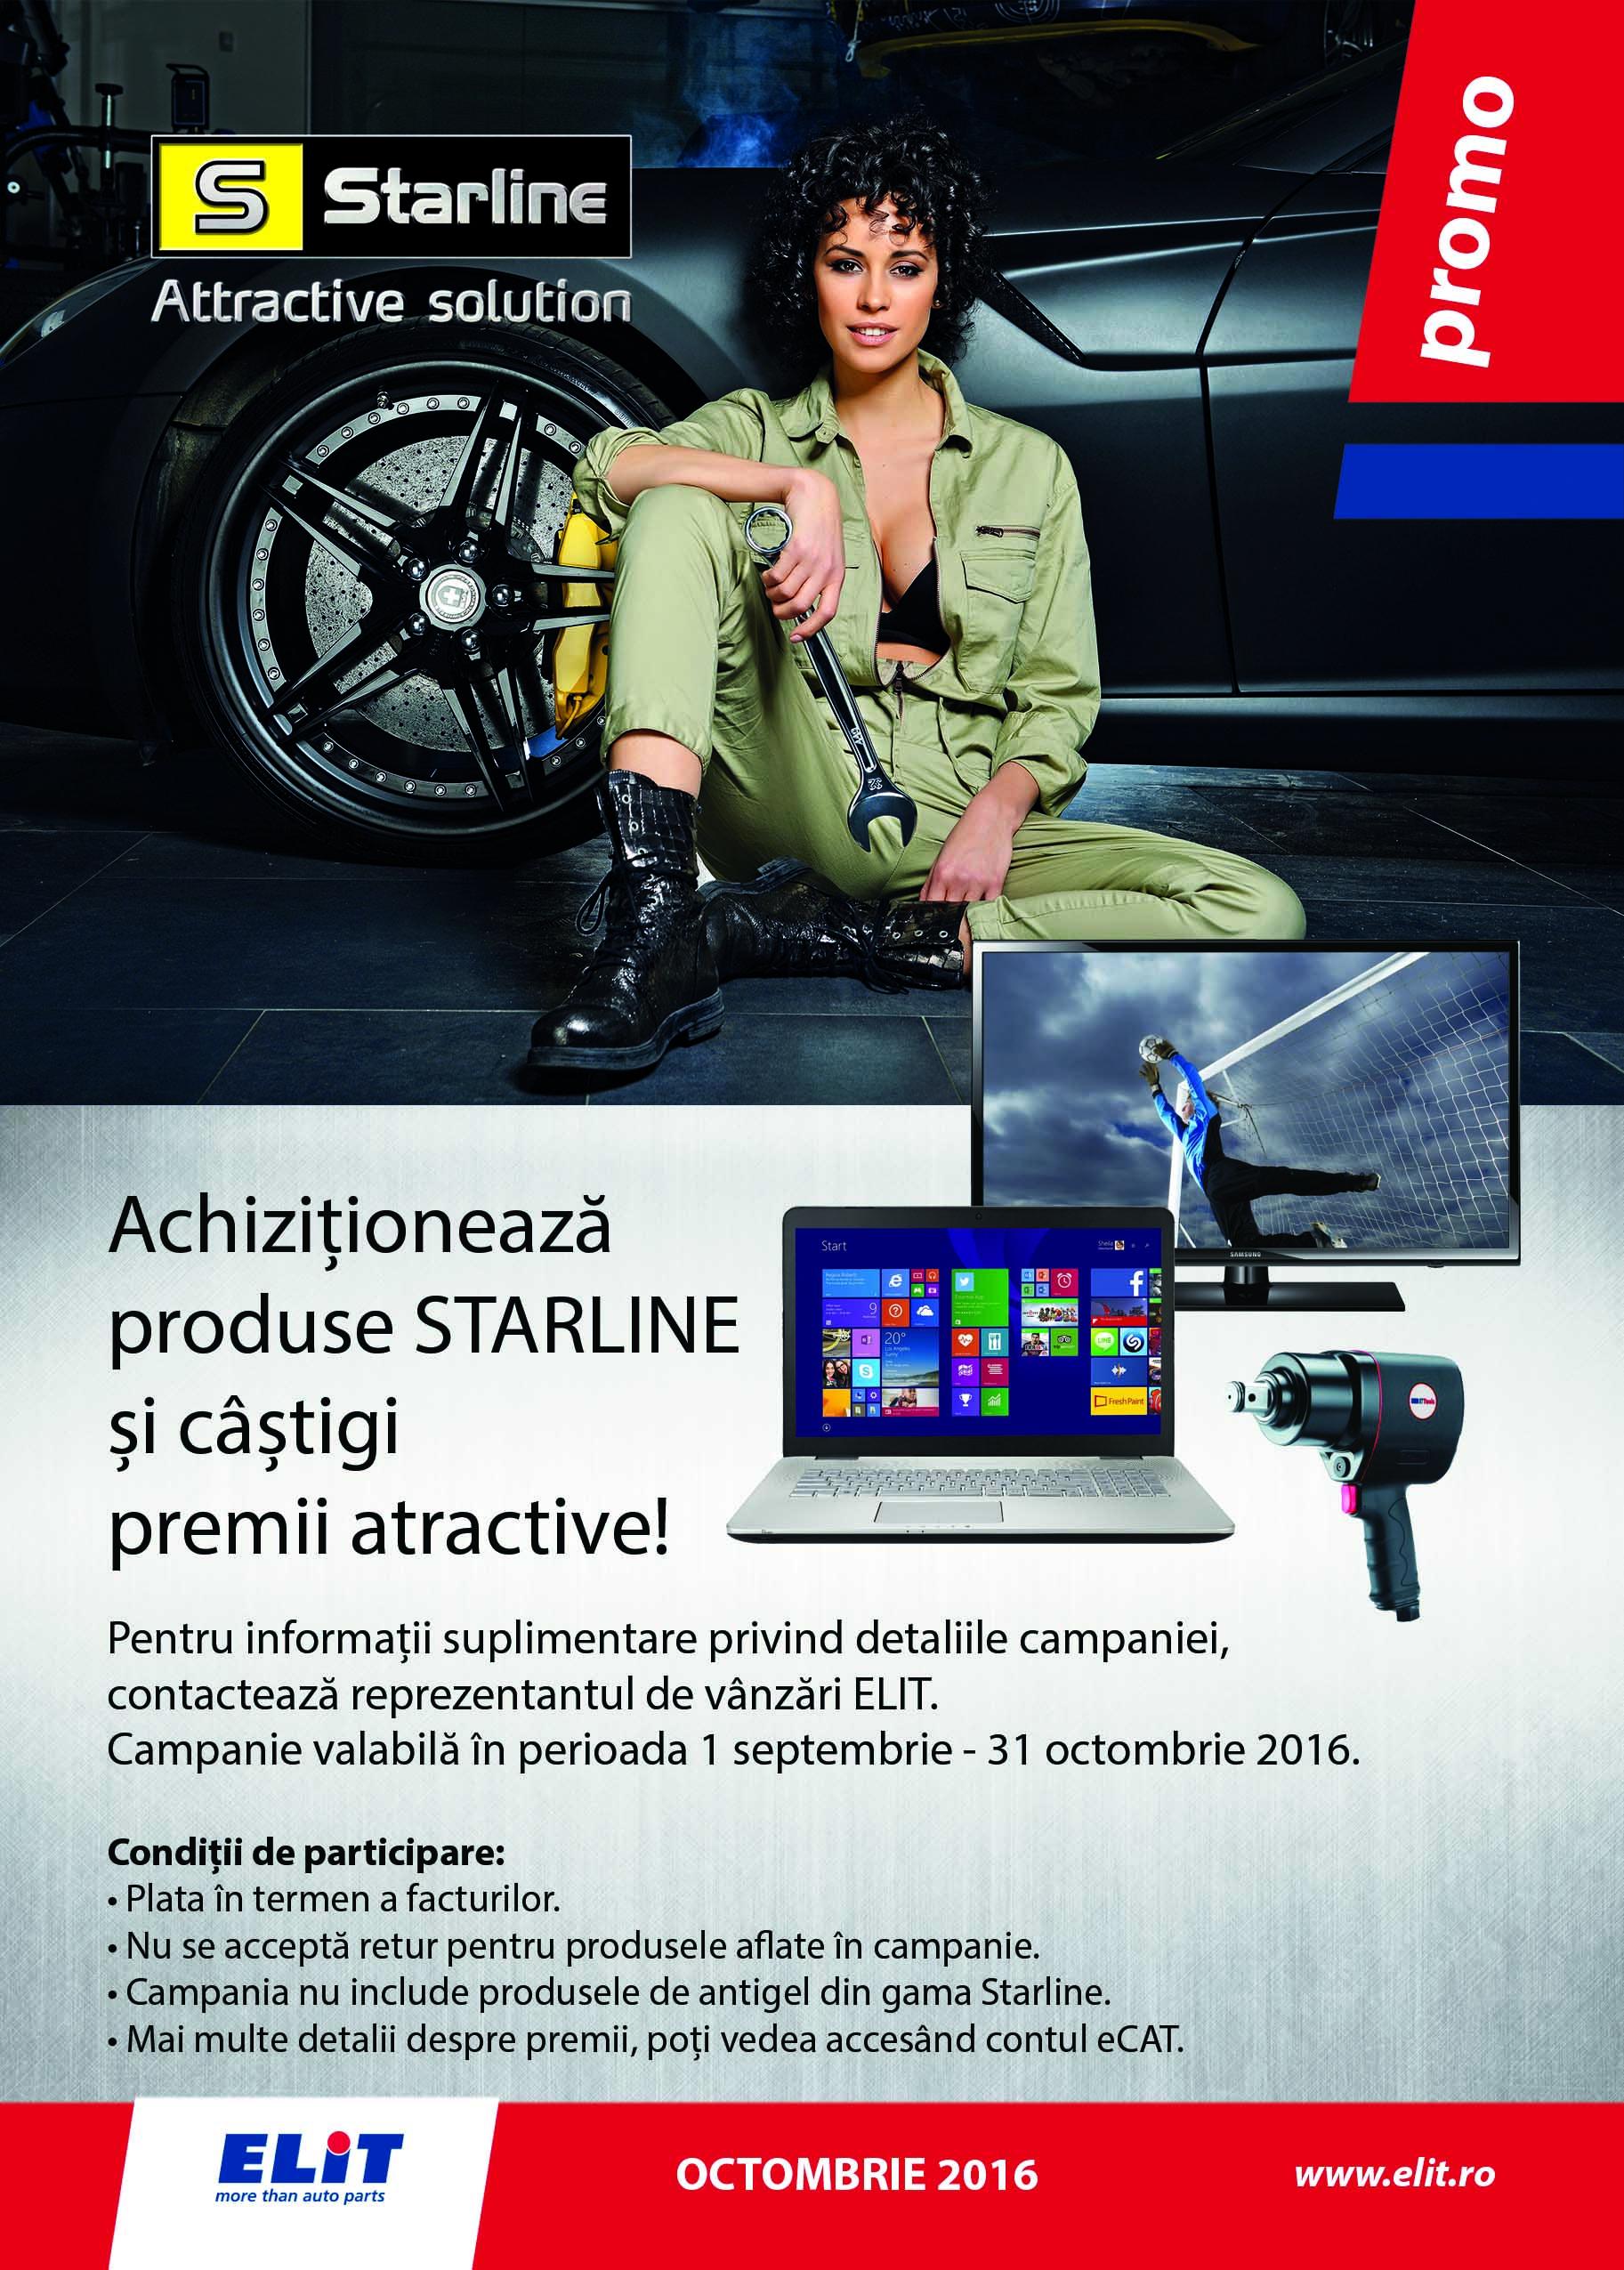 Promo Starline